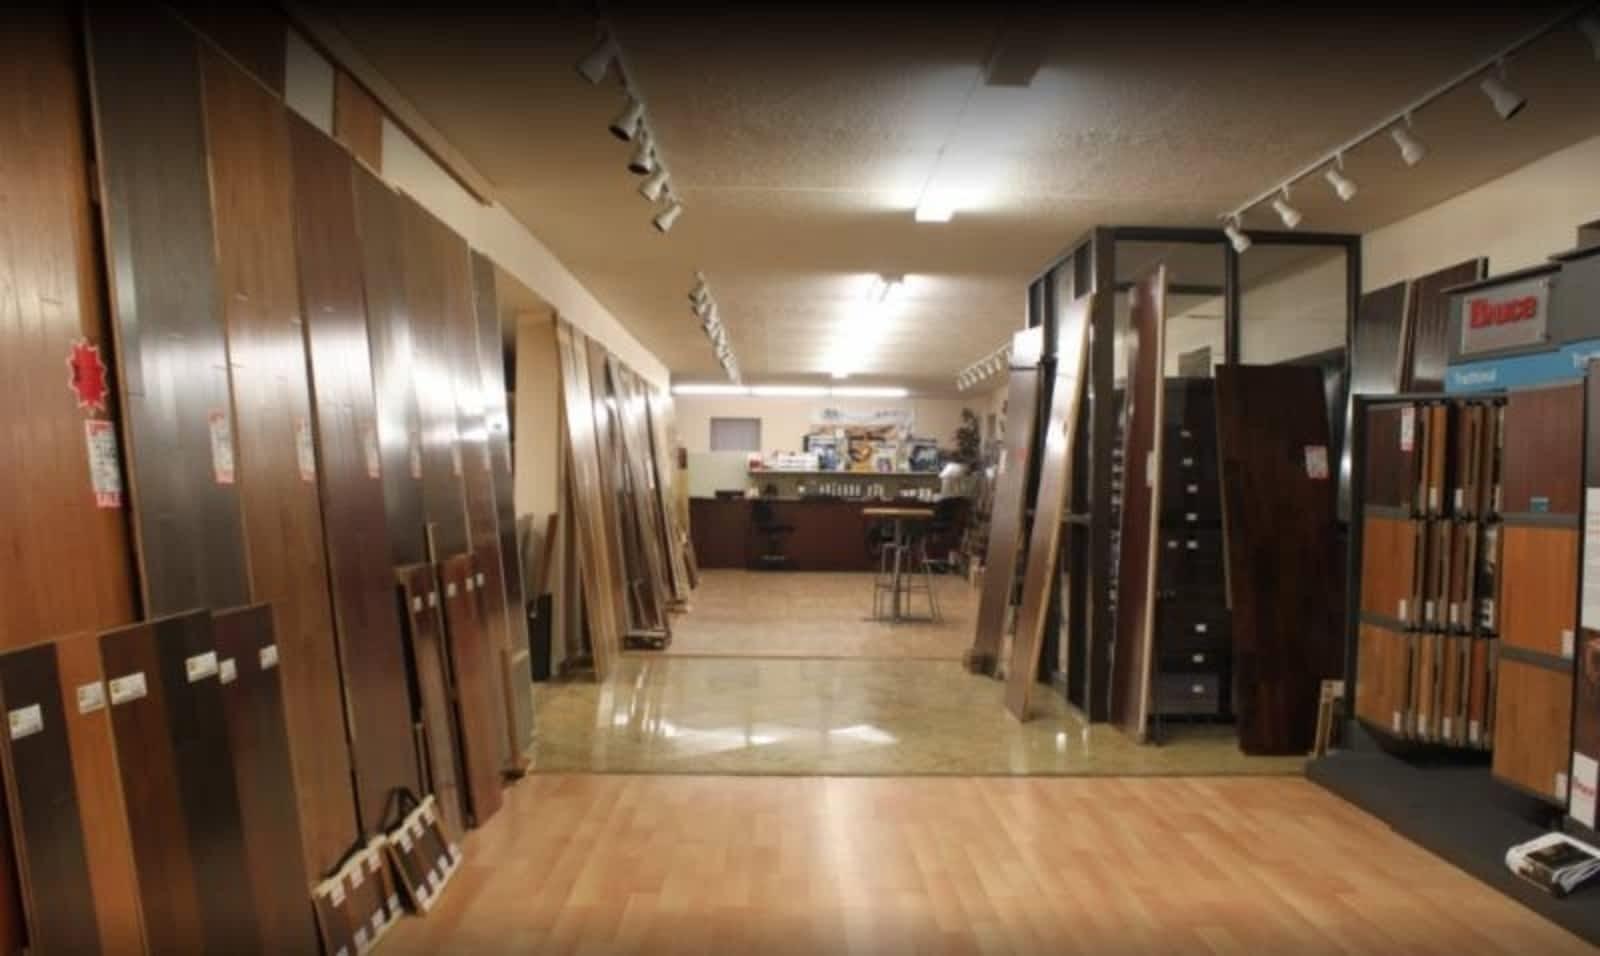 hardwood flooring distributors california of aa floors and more opening hours 524 evans ave etobicoke on regarding aa floors and more 5